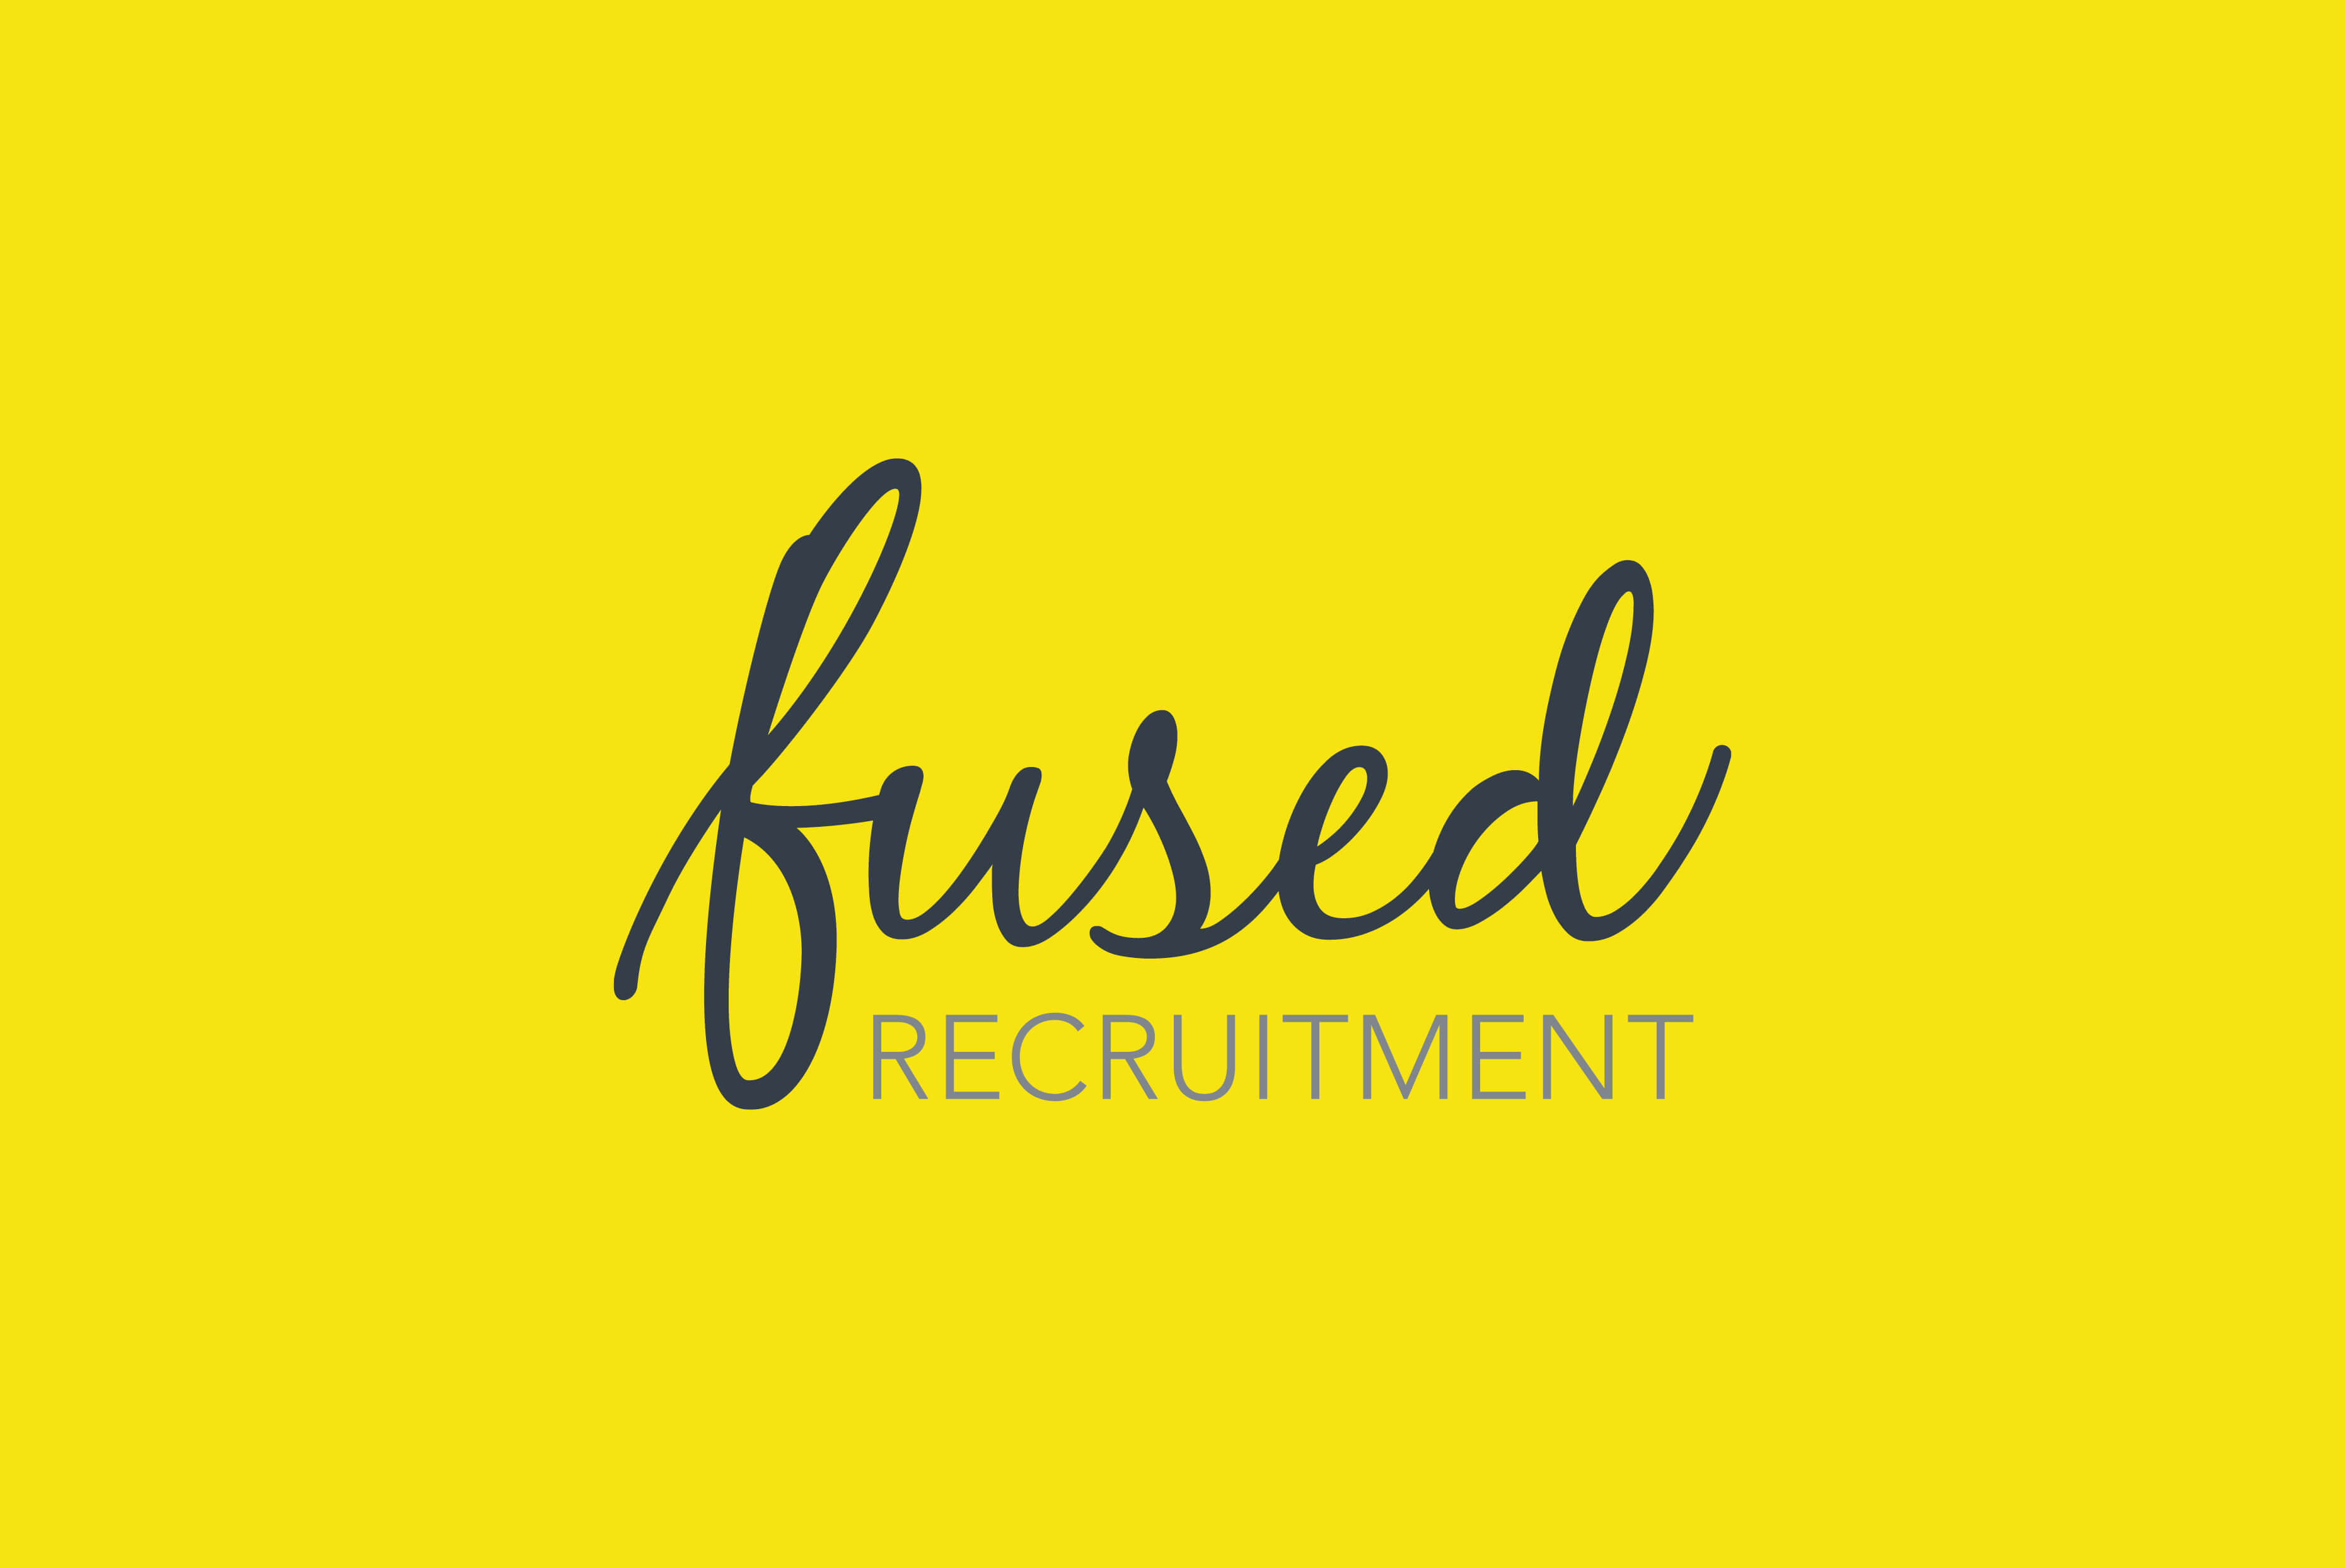 Fused Recruitment Branding   Independent Marketing - IM London   London Branding Agency